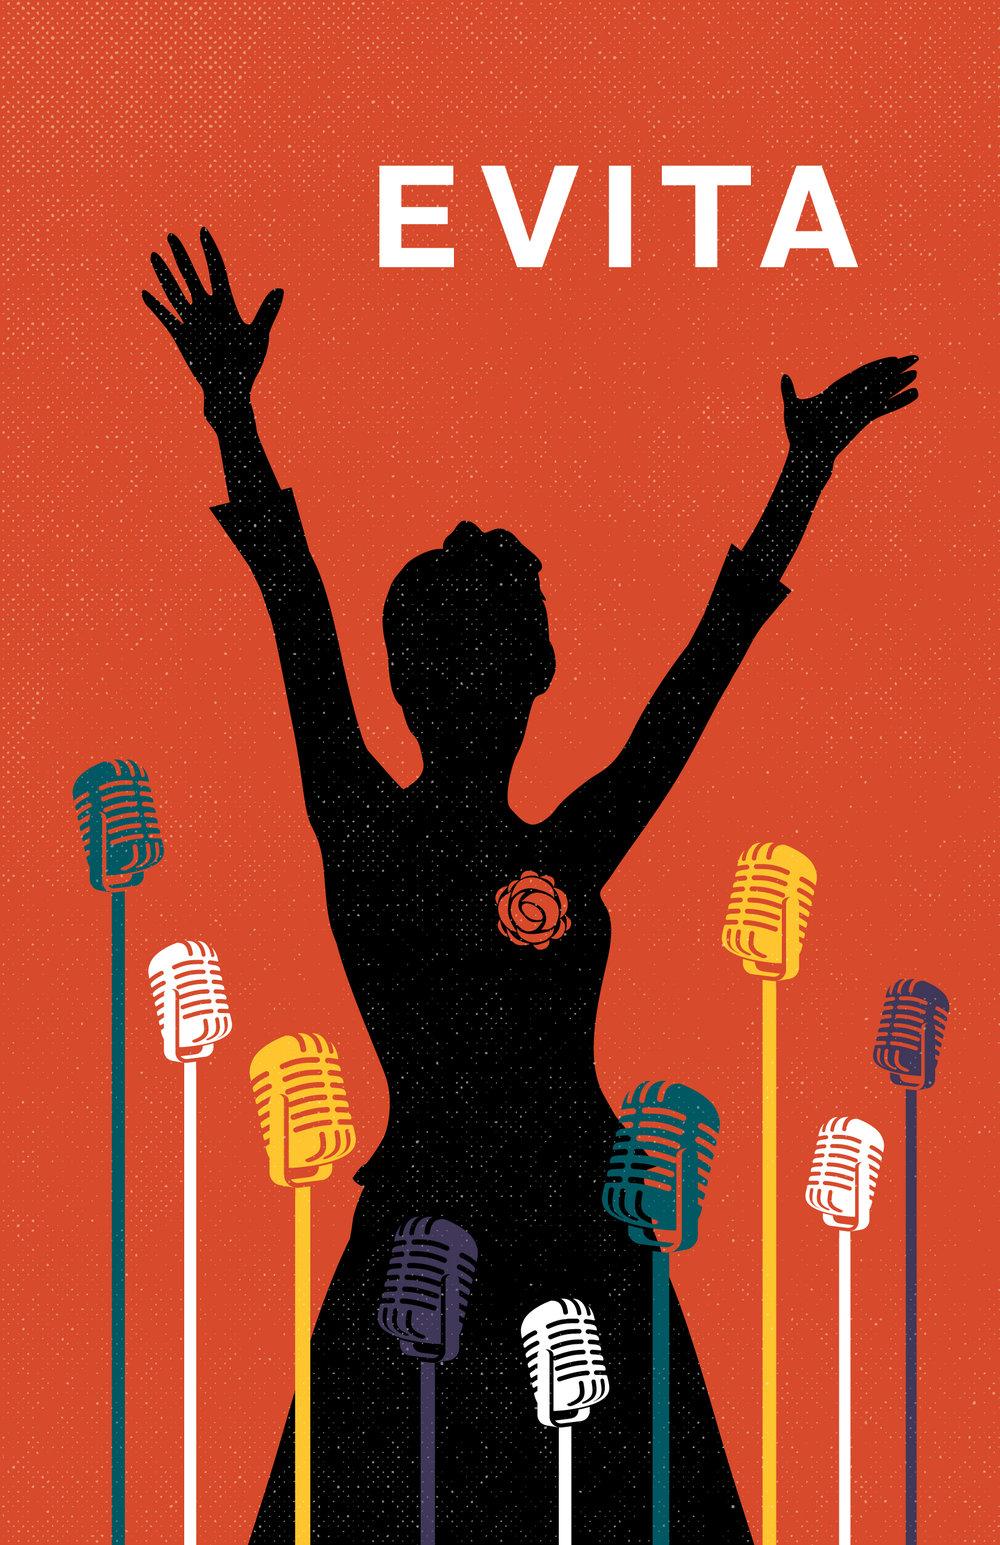 1819-07-Evita-Show-Image-Vertical.jpg